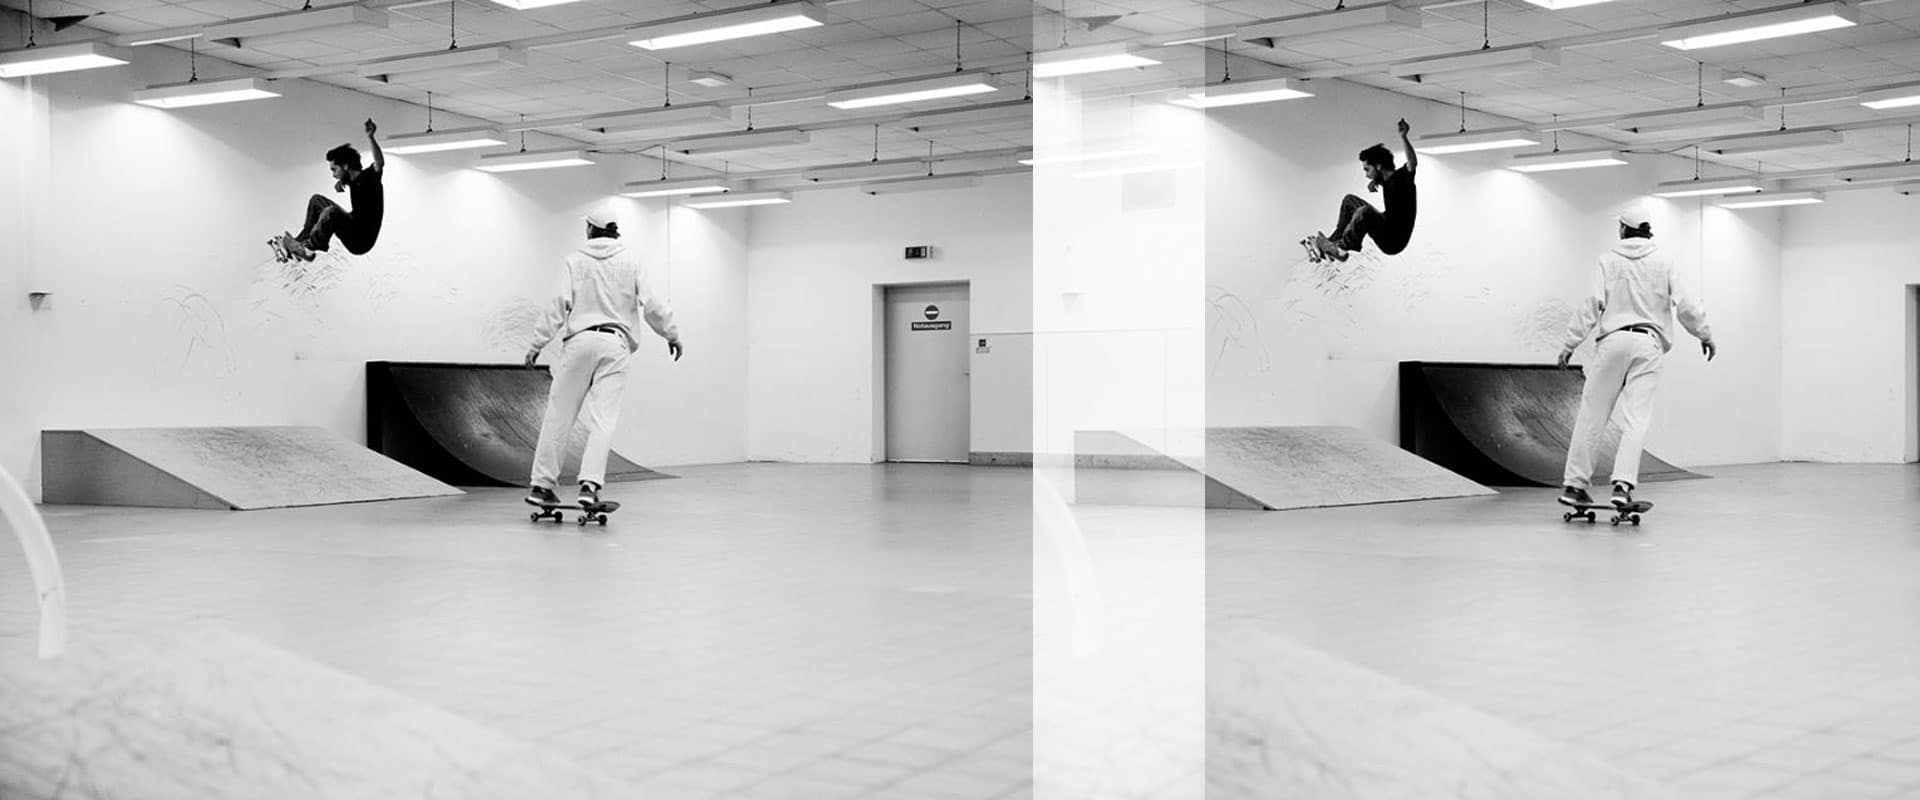 quarter_dist_skateboardshjfmXj3HfXSgb